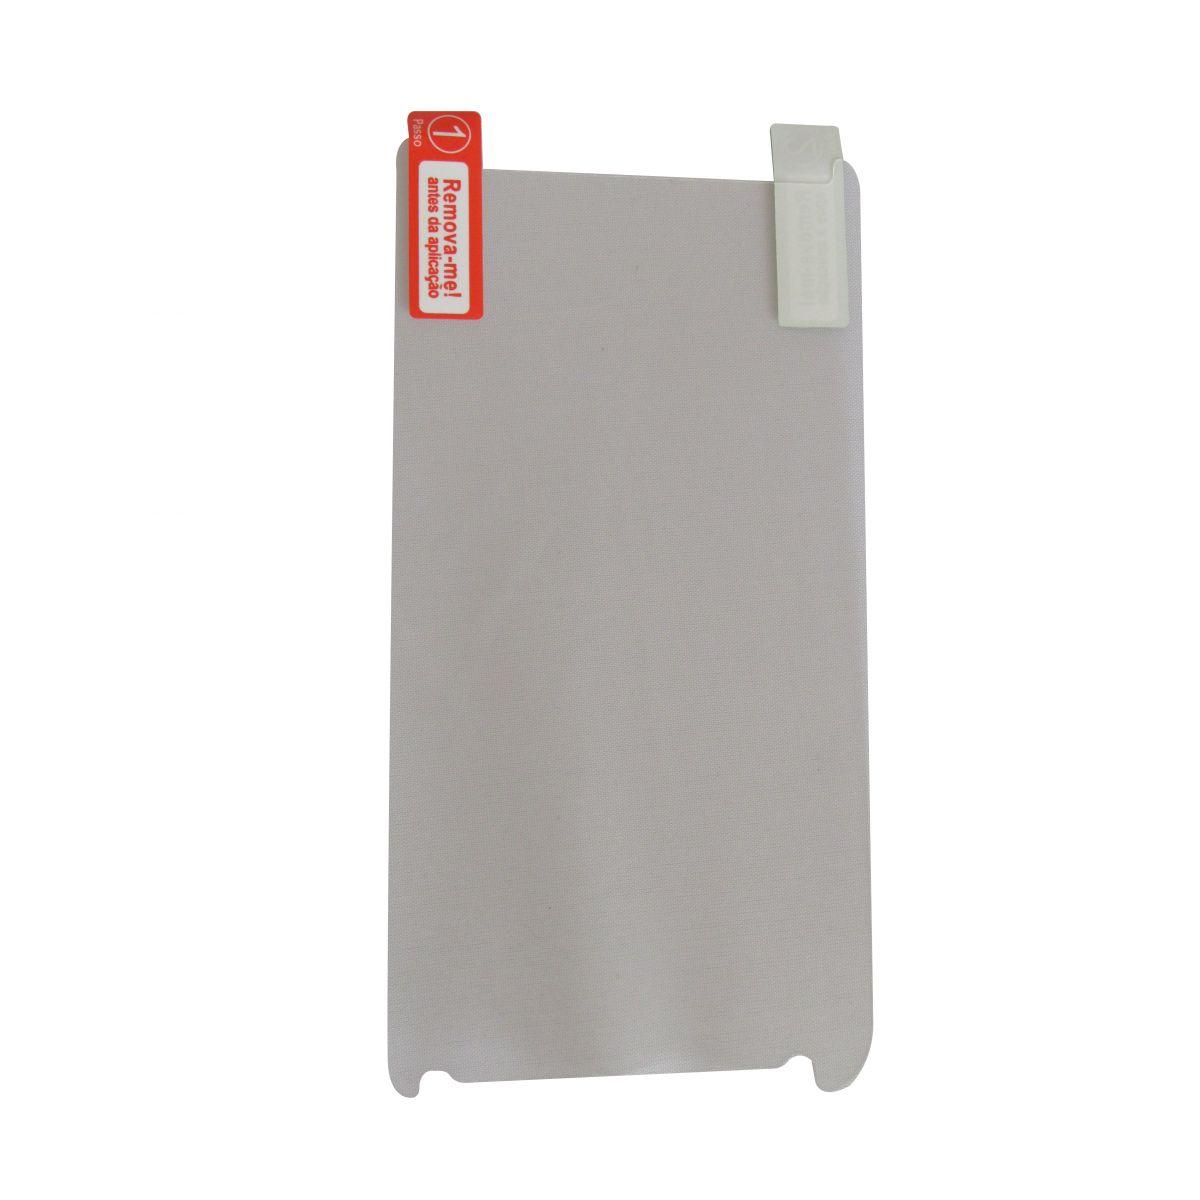 Película Protetora para Motorola Moto X2 XT1096 - Fosca